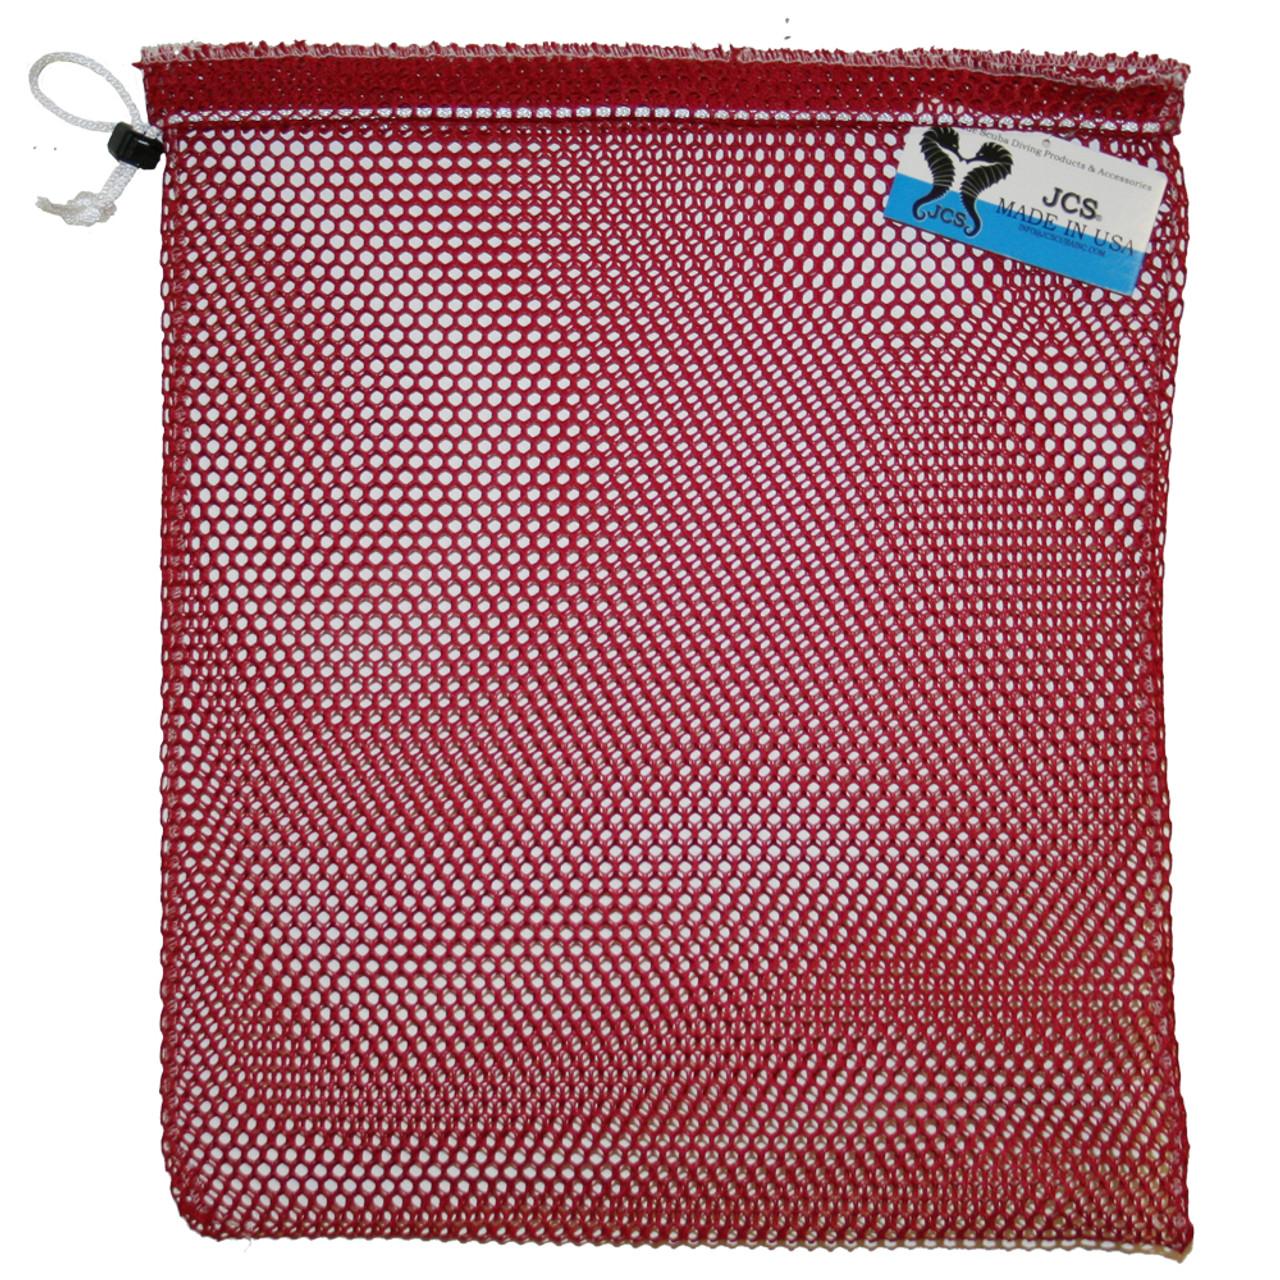 20ea596d1725 Nylon Mesh Drawstring Bag, Approx. 15x20